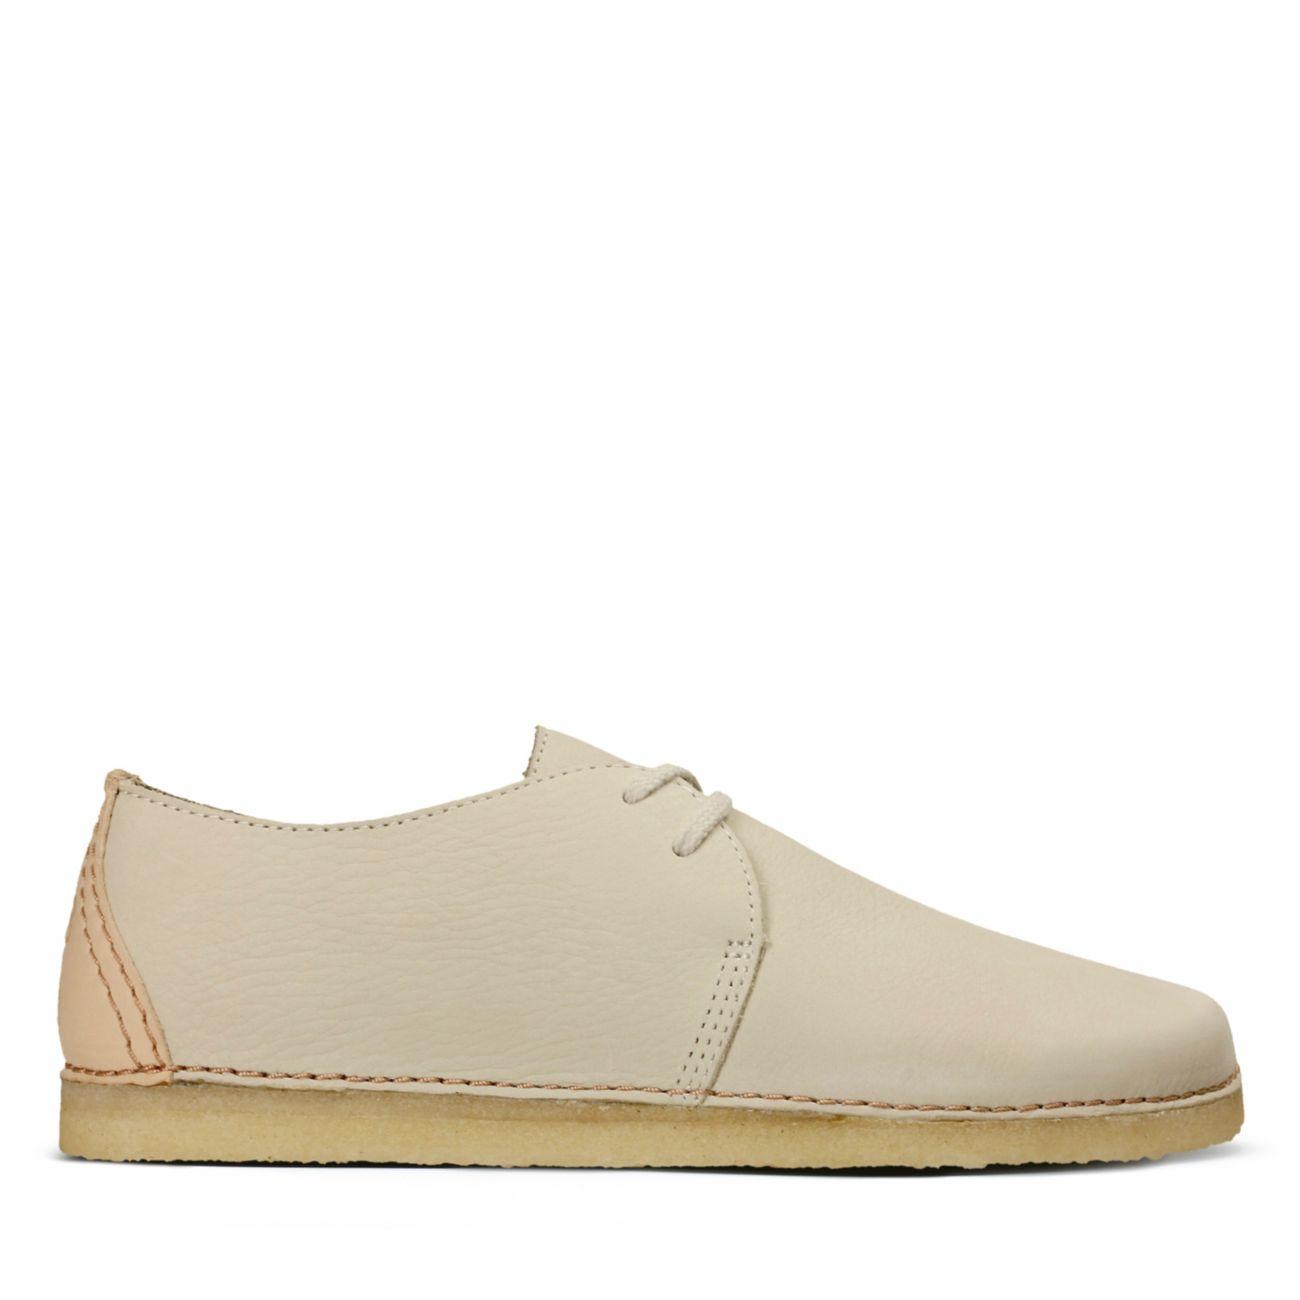 Clarks Originals Blanc Femme Desert Boot F & Chaussures